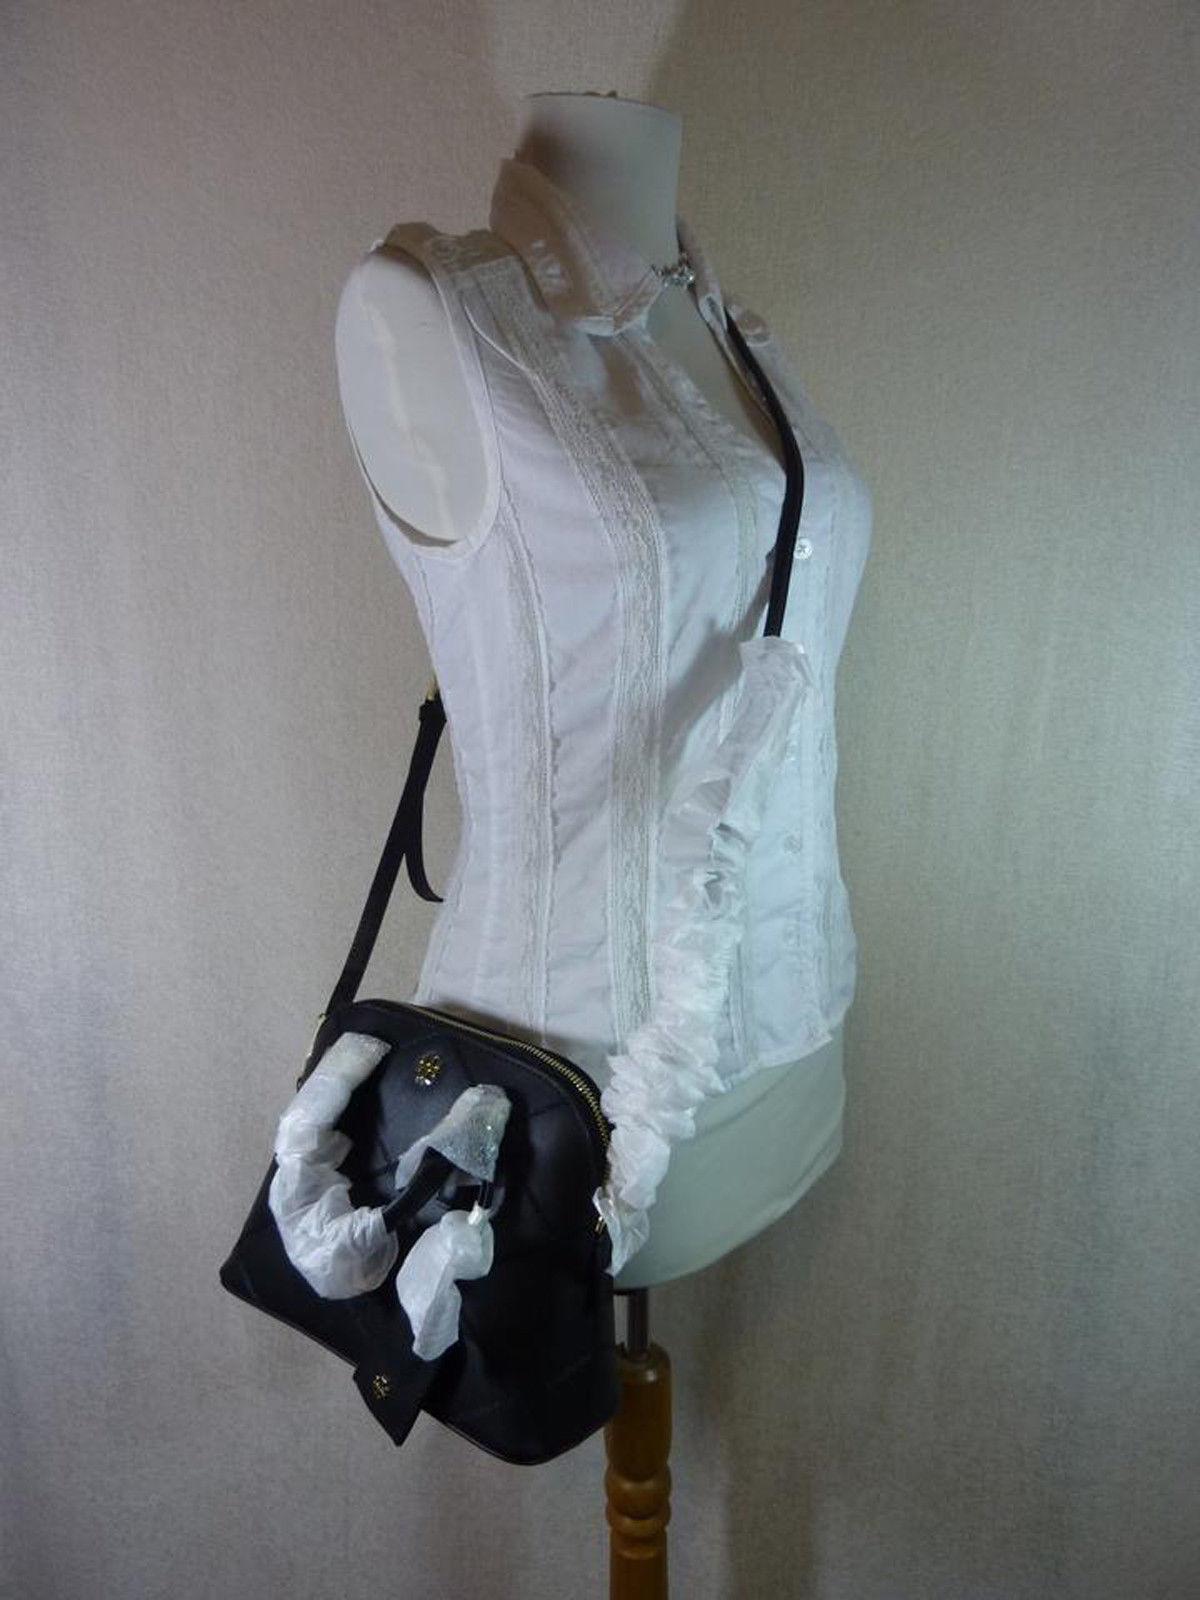 NWT Tory Burch Black Saffiano Mini Robinson Stitched Dome Cross Body Bag  - $425 image 7